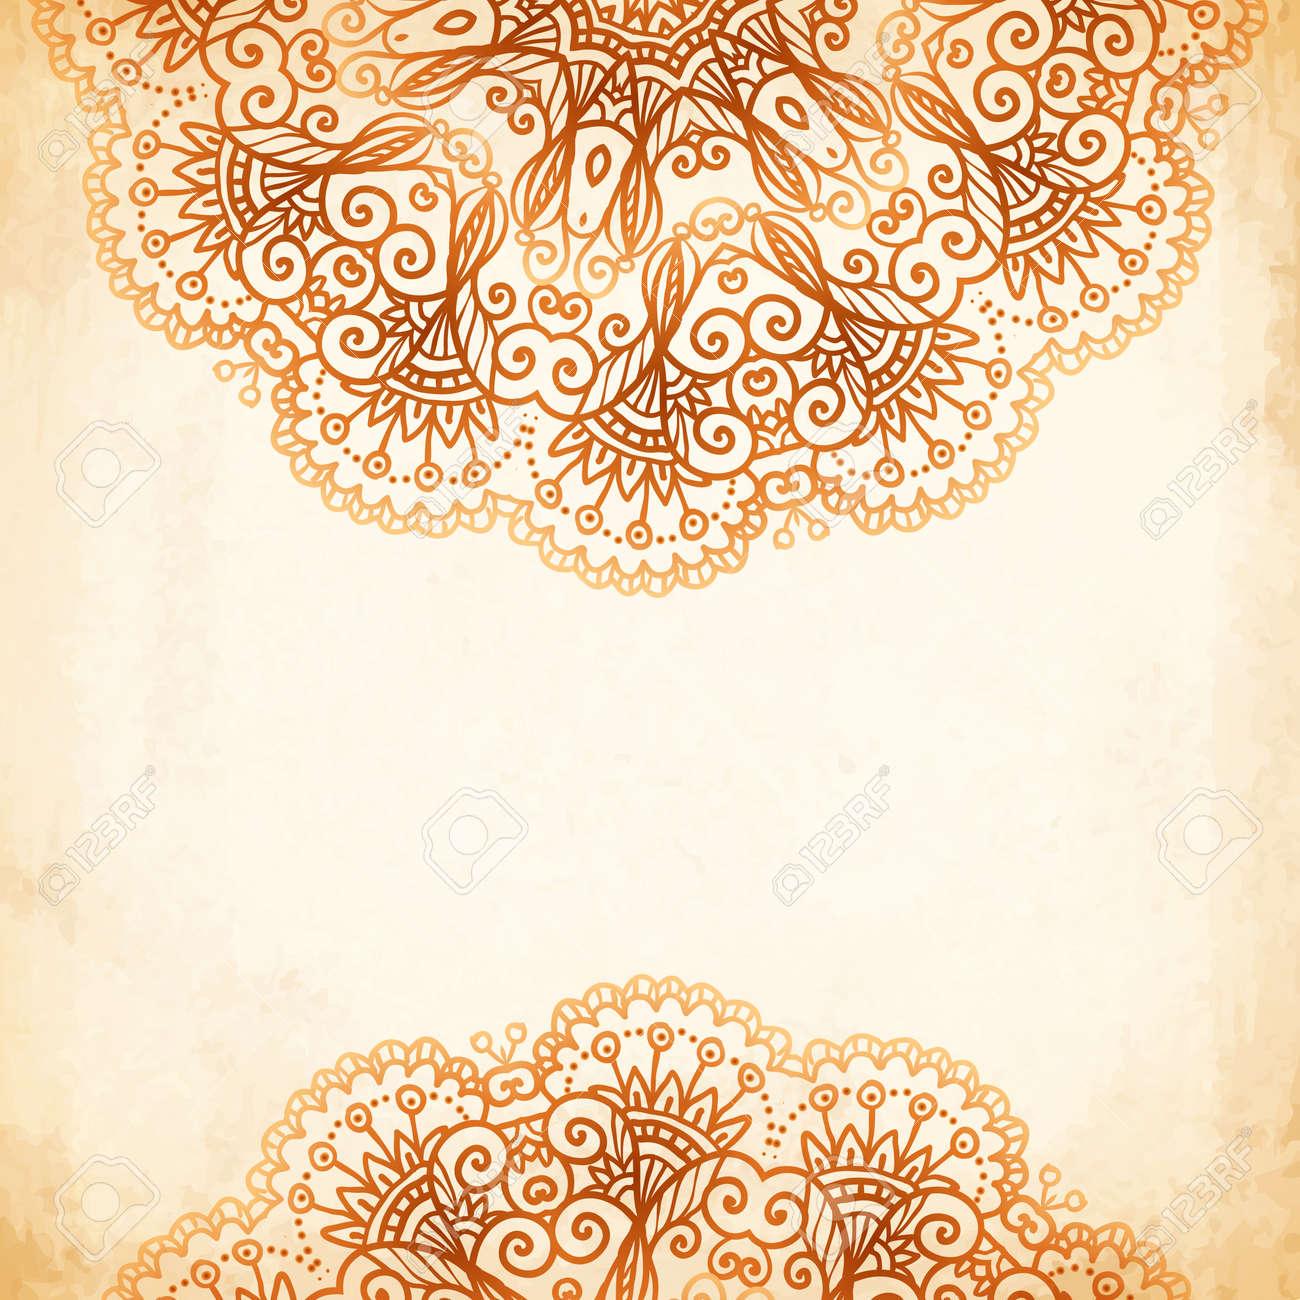 Ornate vintage vector background in mehndi style royalty free stock - Ornate Vintage Circle Vector Seamless Pattern In Mehndi Style Stock Vector 25742039